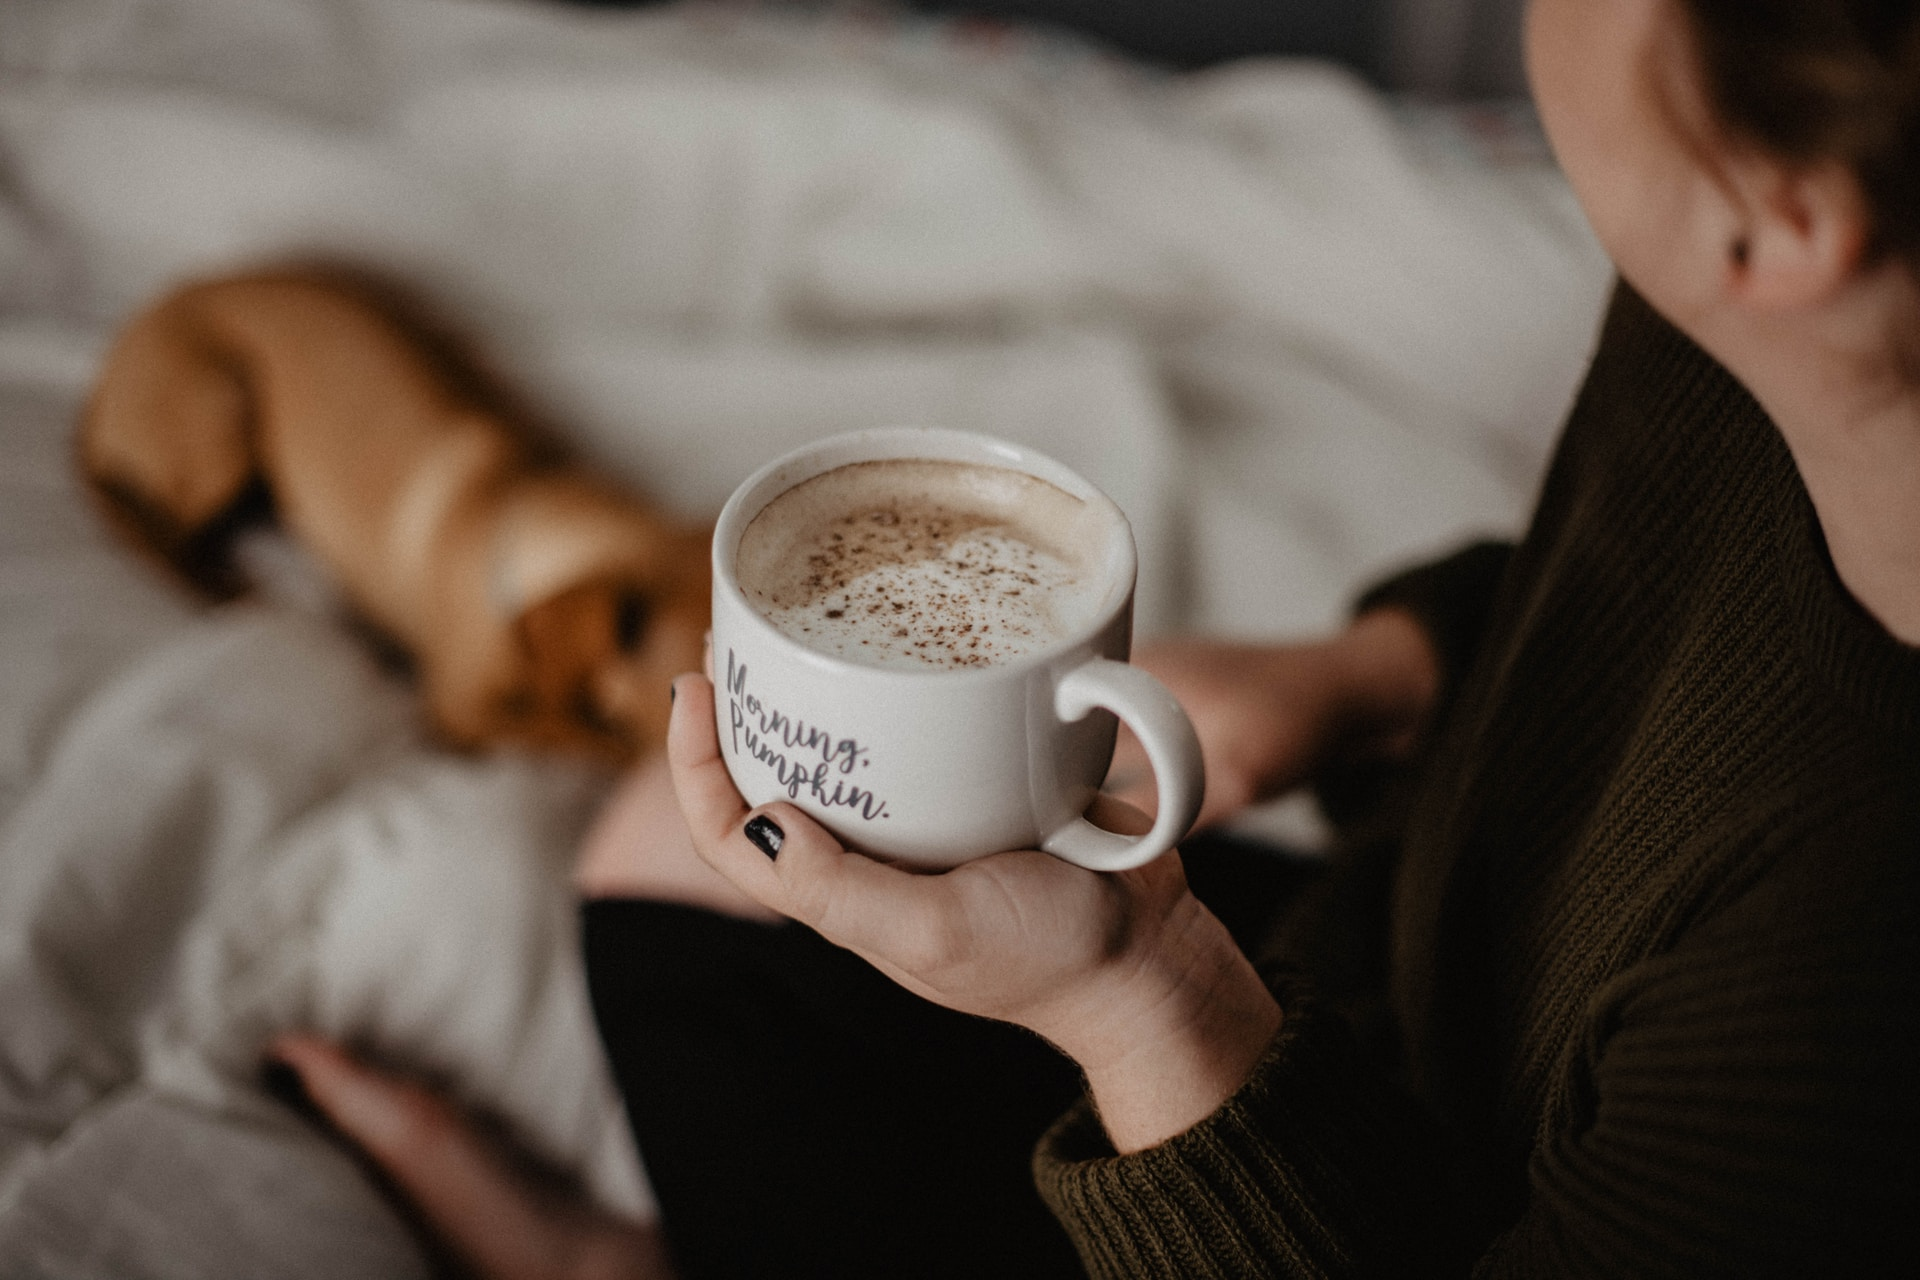 woman holding white ceramic teacup sitting on white blanket near short-coated tan dog